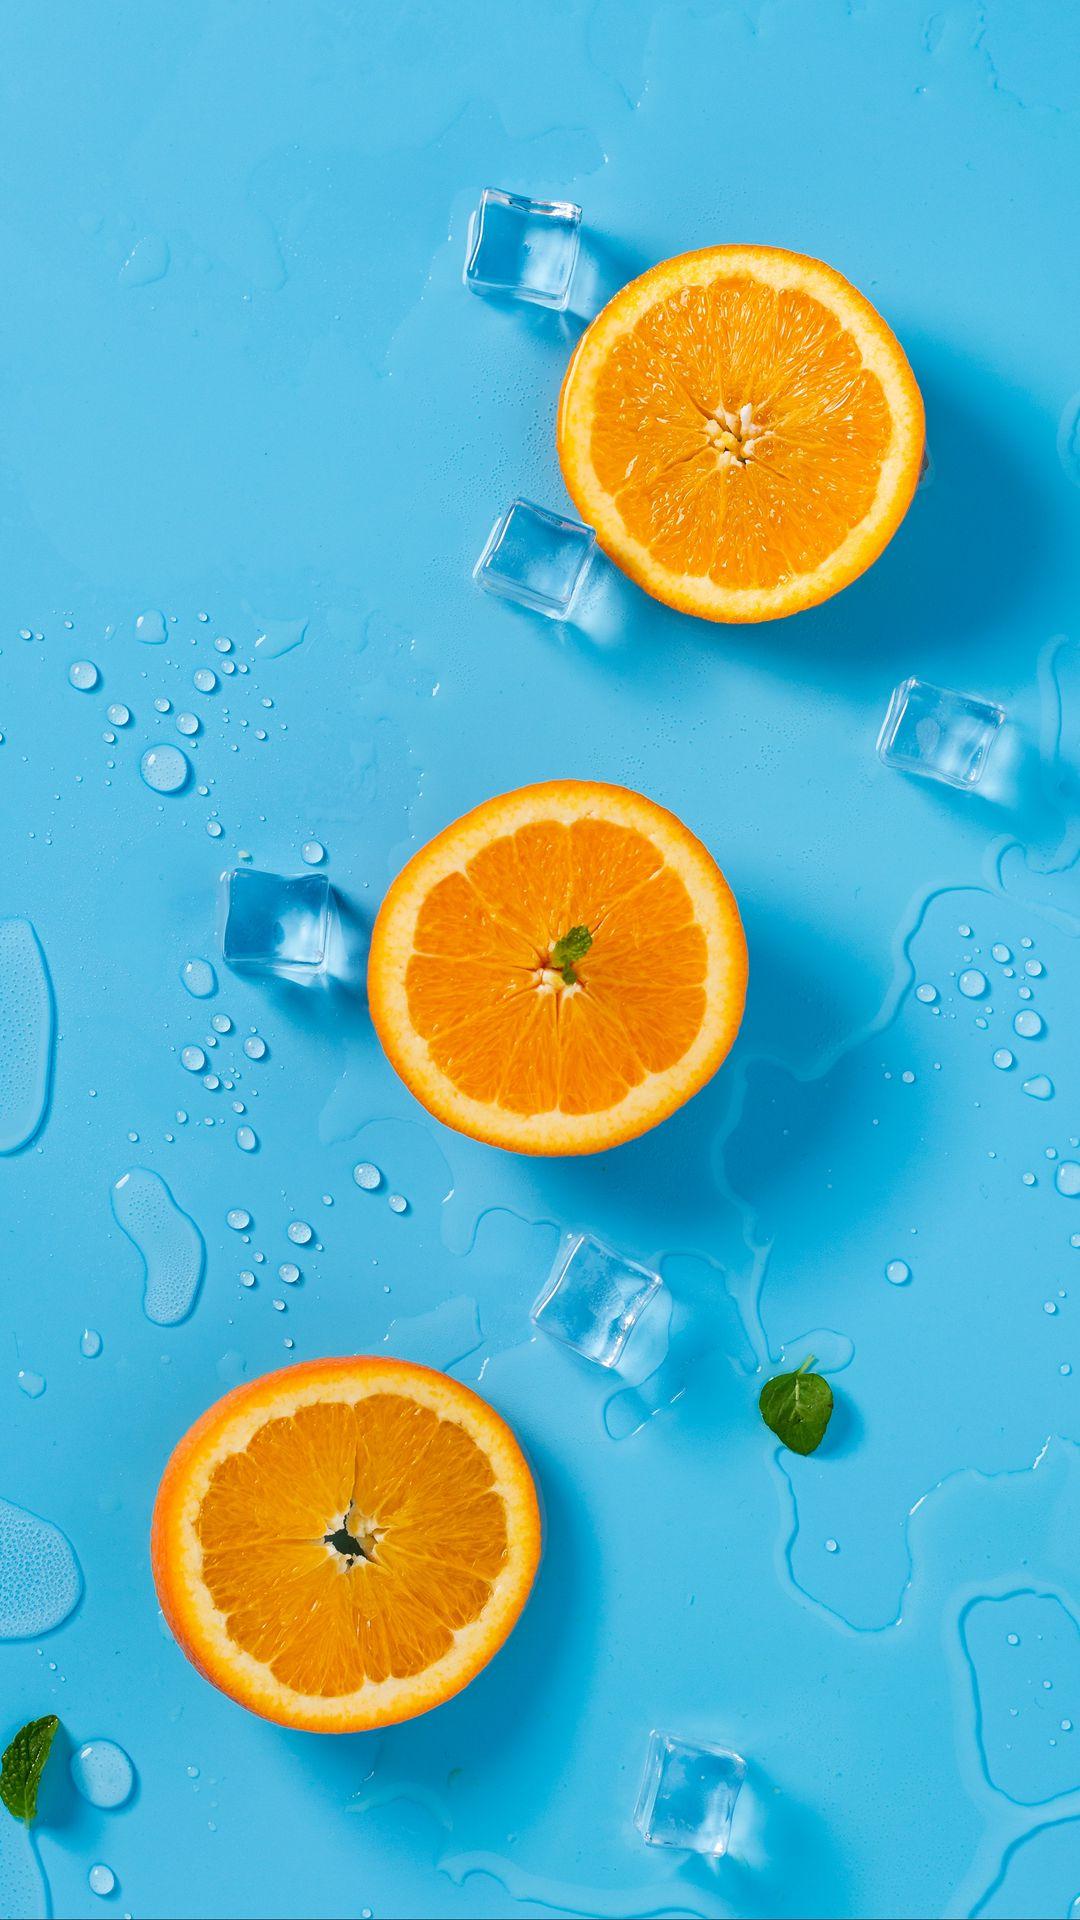 1080x1920 Wallpaper orange, ice, mint, citrus, rings, melting